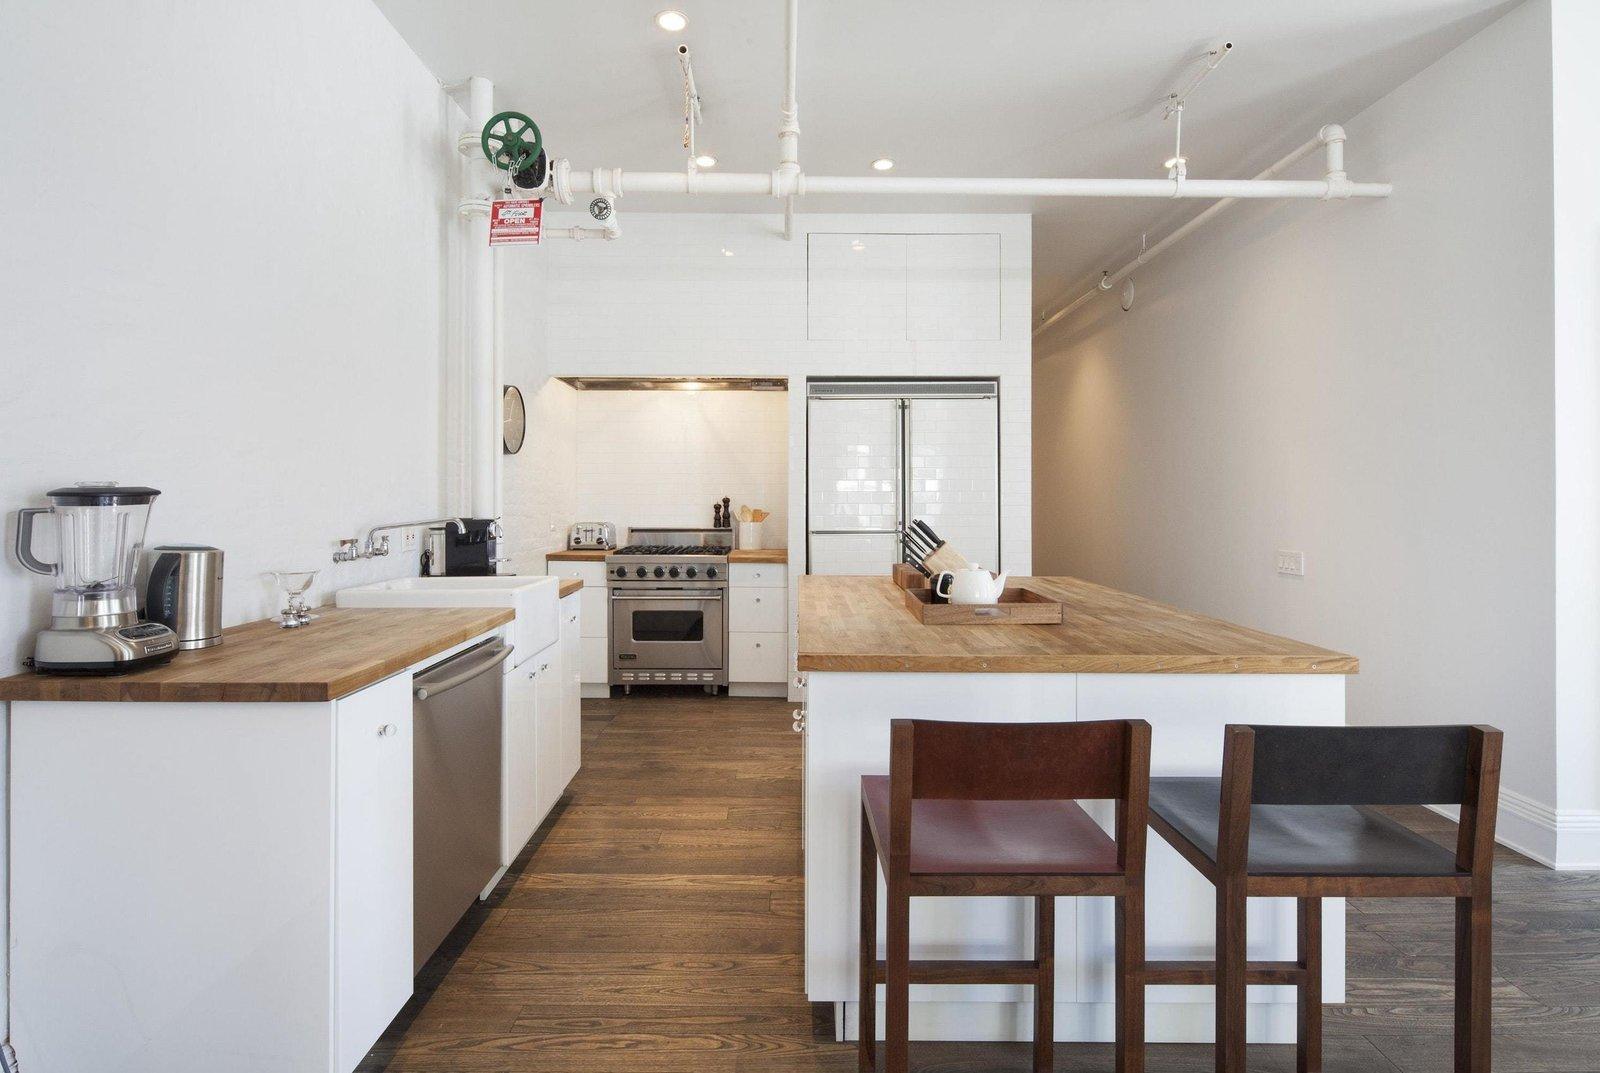 Kitchen, Wood Counter, Wall Oven, Dishwasher, Refrigerator, Range, Medium Hardwood Floor, Vessel Sink, White Cabinet, and Recessed Lighting  Prince Street